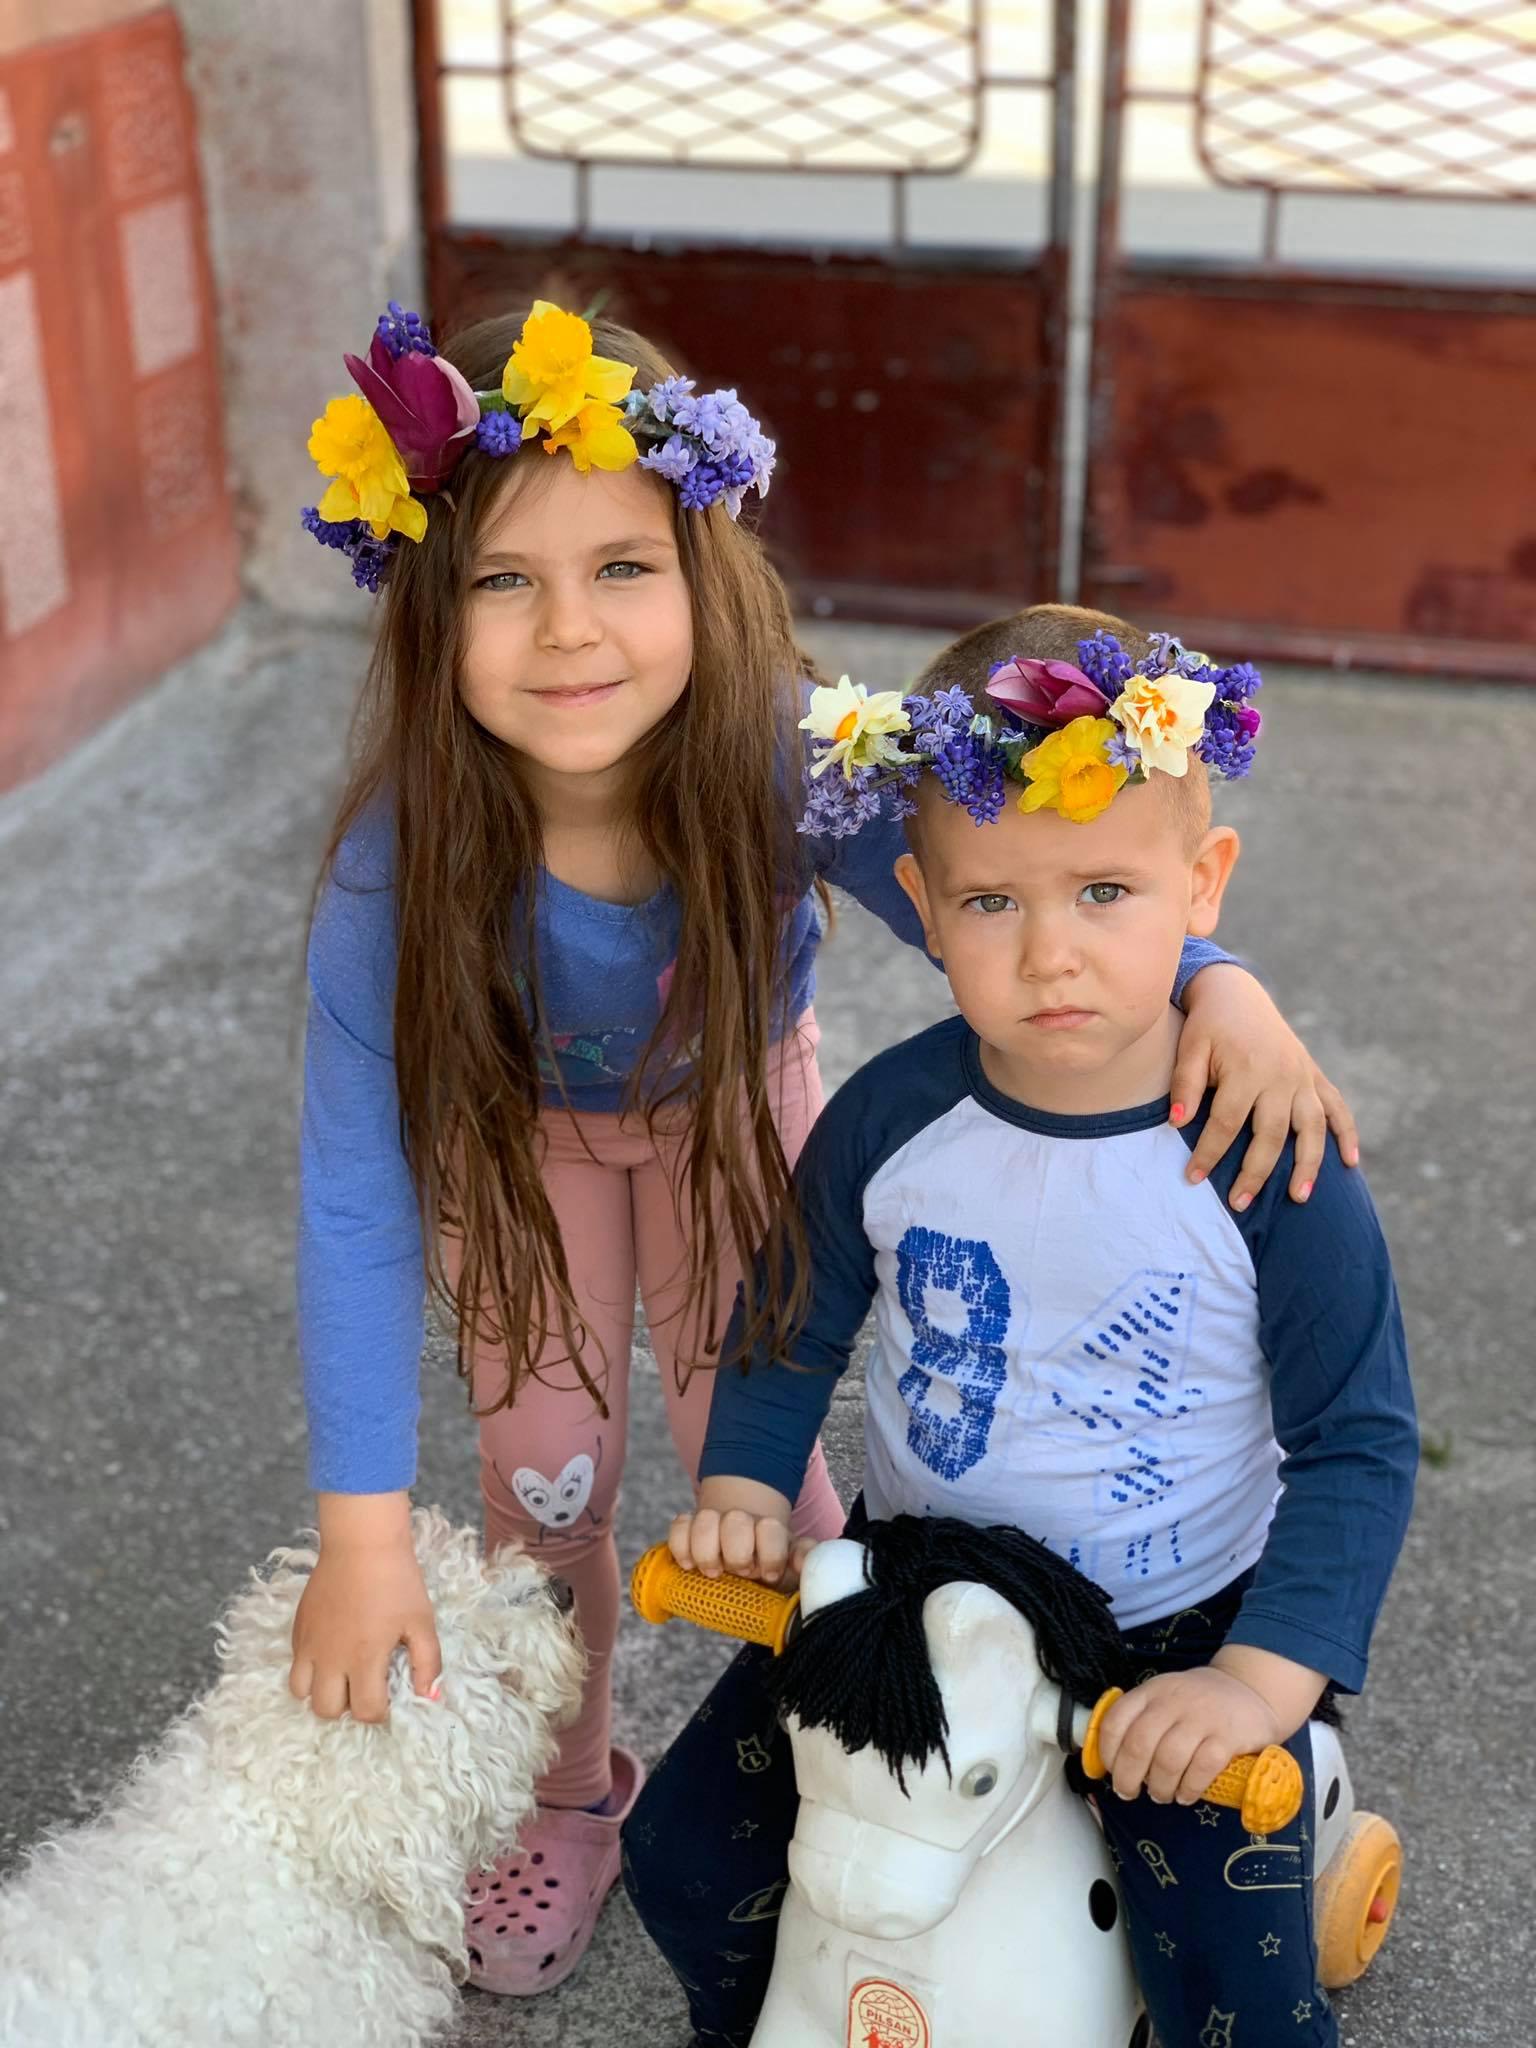 Photo of Vrbica u Pirotu. Radosni dečji praznik obeležen u domovima *FOTO*